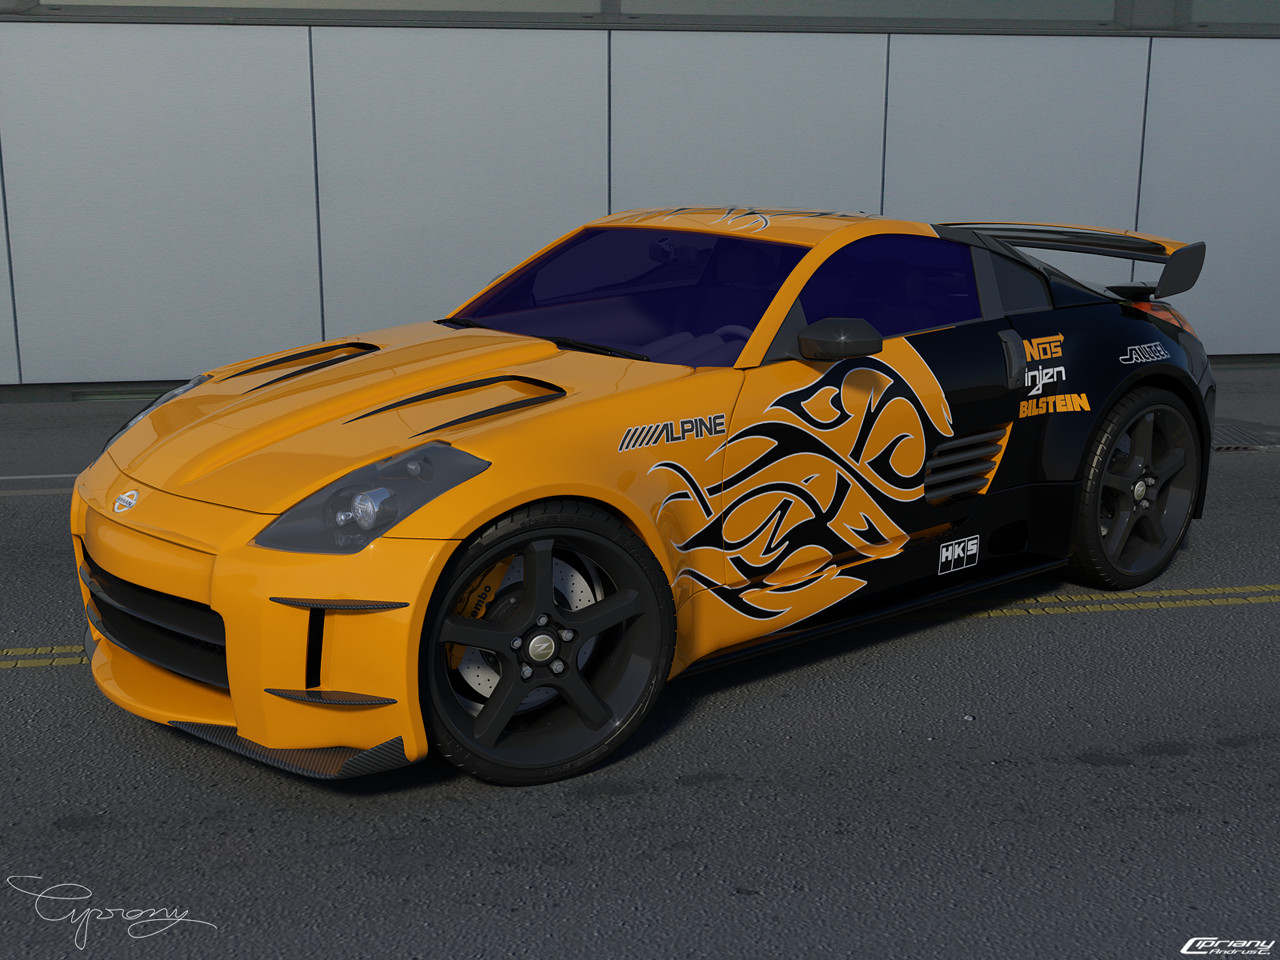 Attractive Street Car Racer Pattern - Classic Cars Ideas - boiq.info